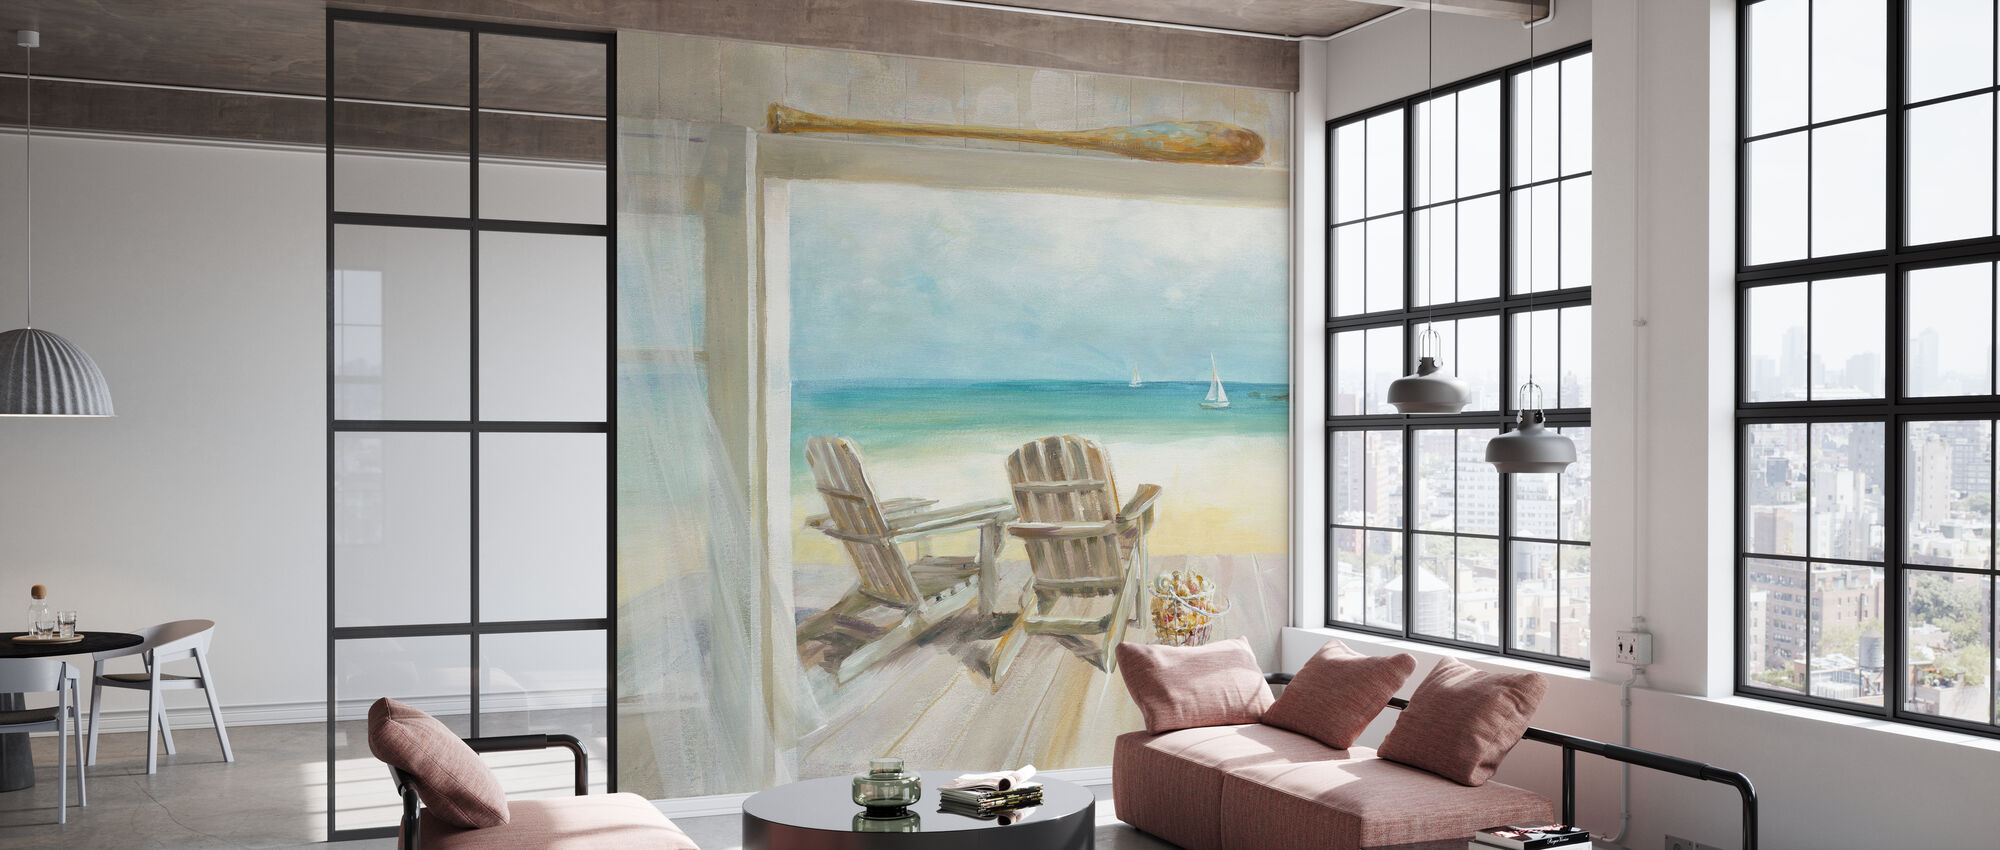 Seaside Morning - Wallpaper - Office